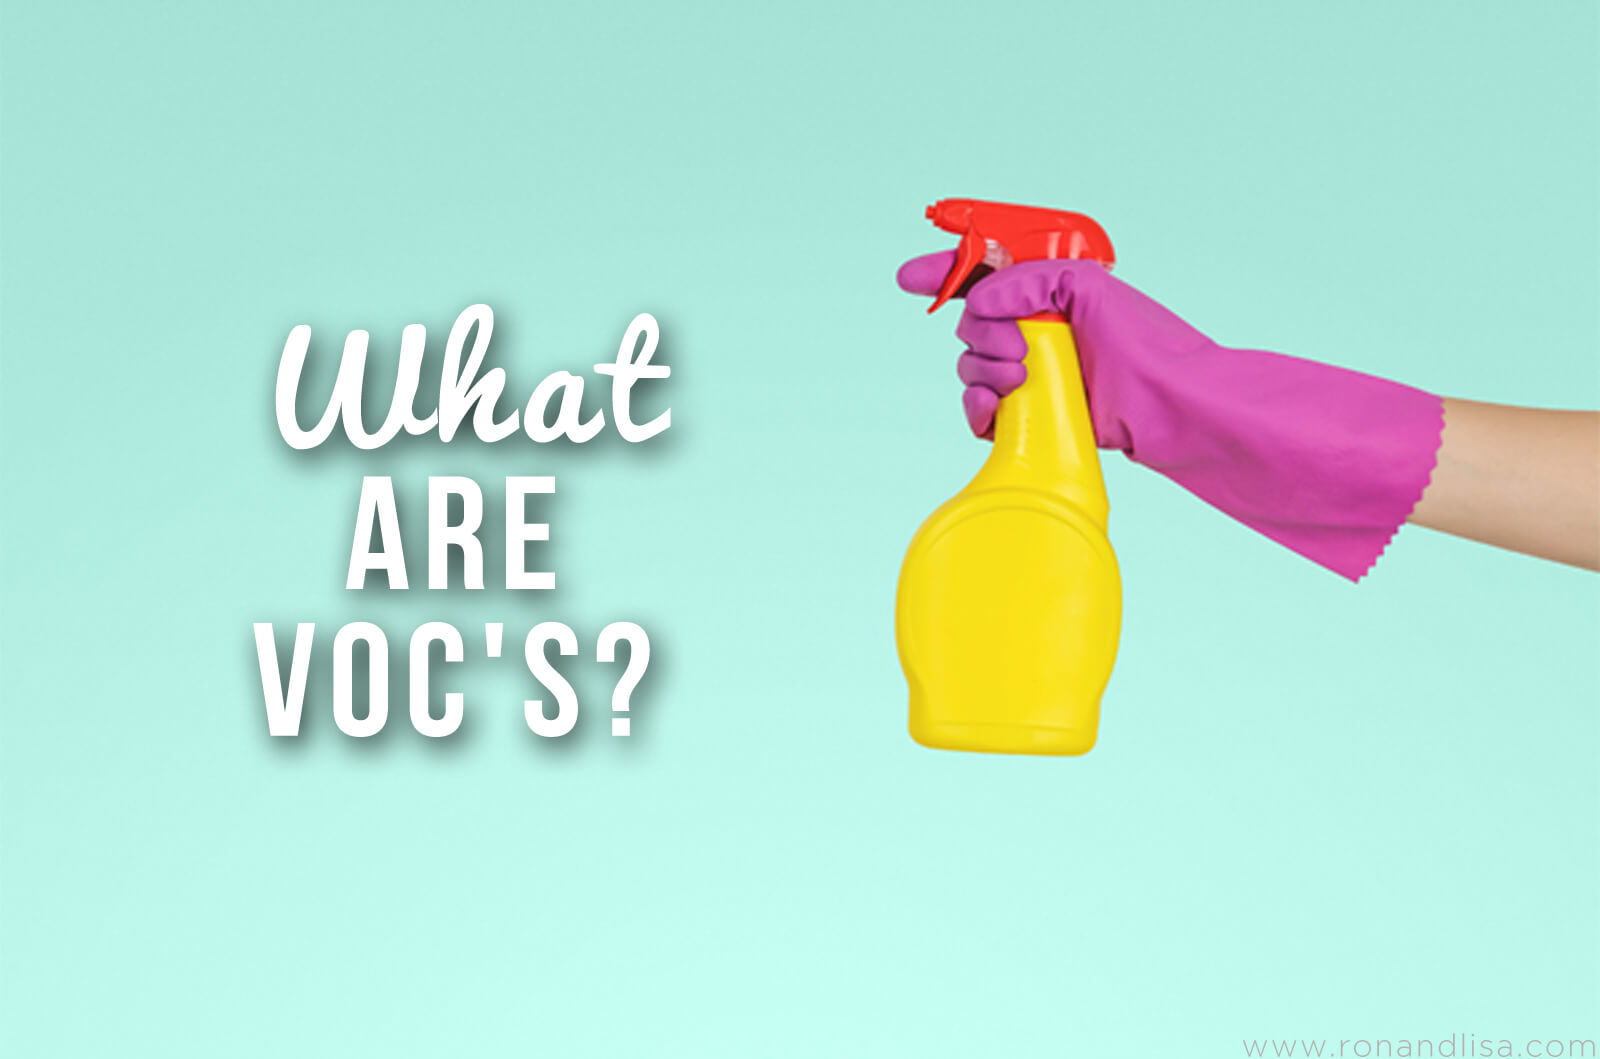 What Are VOC's?